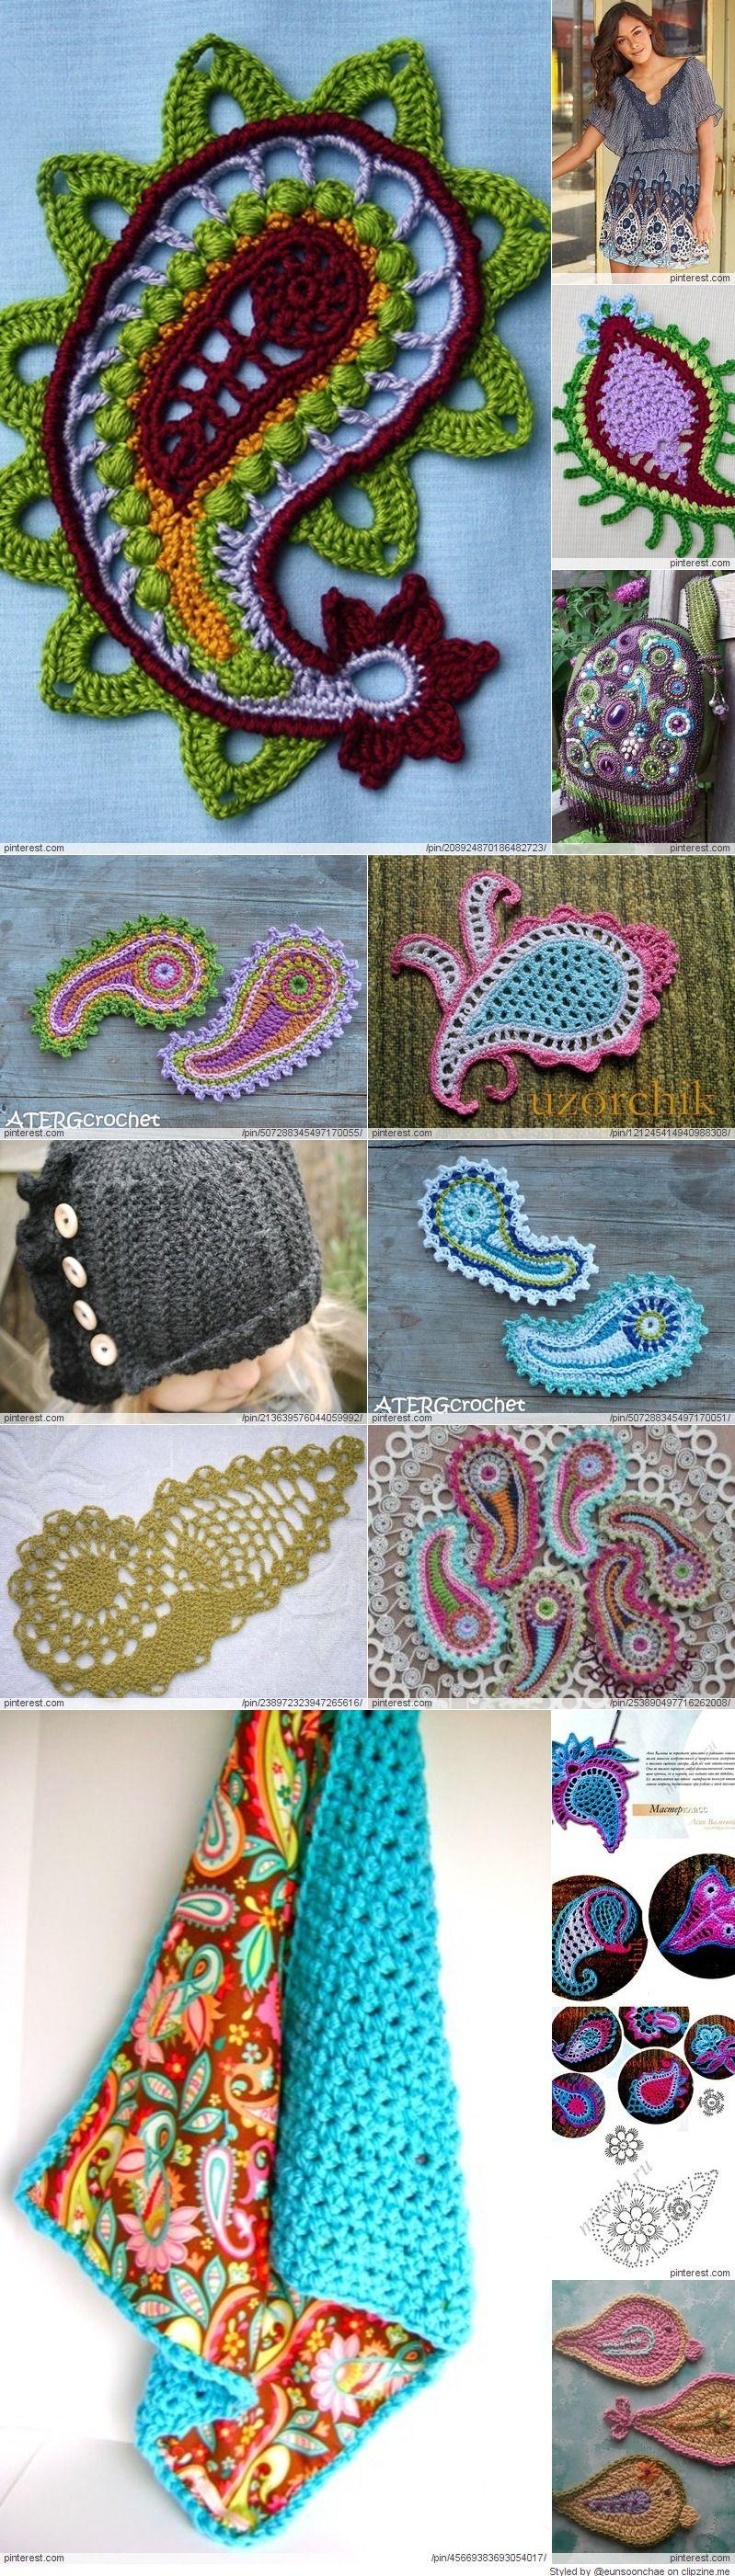 Crochet Paisley Patterns Sewing Pinterest Crochet Crochet